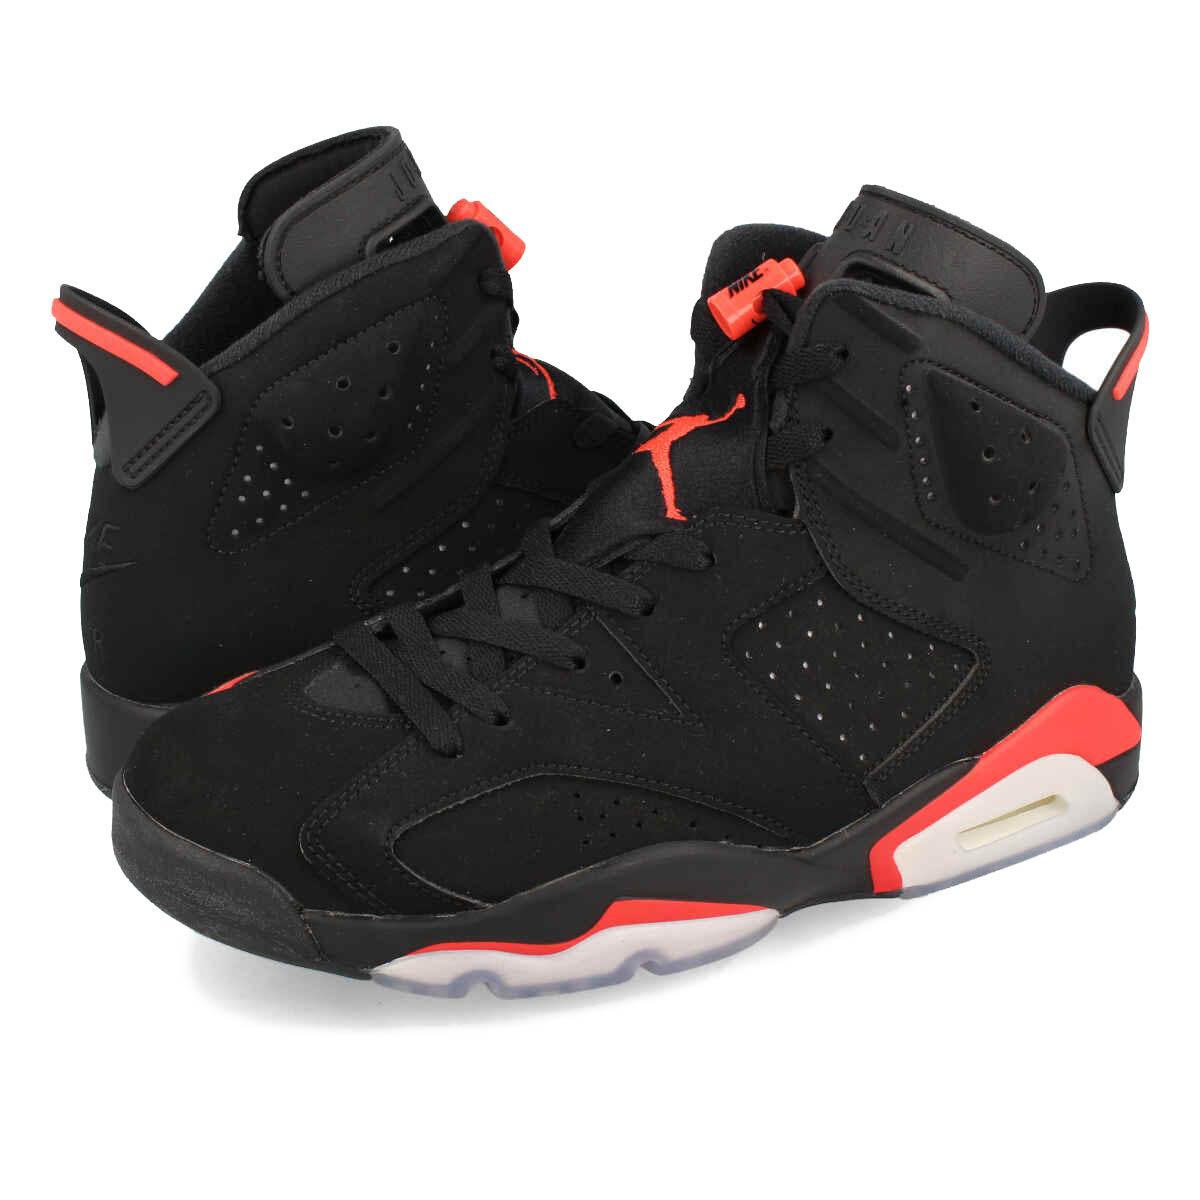 a665b0049be7 NIKE AIR JORDAN 6 RETRO GS Nike Air Jordan 6 nostalgic GS BLACK INFRARED  384